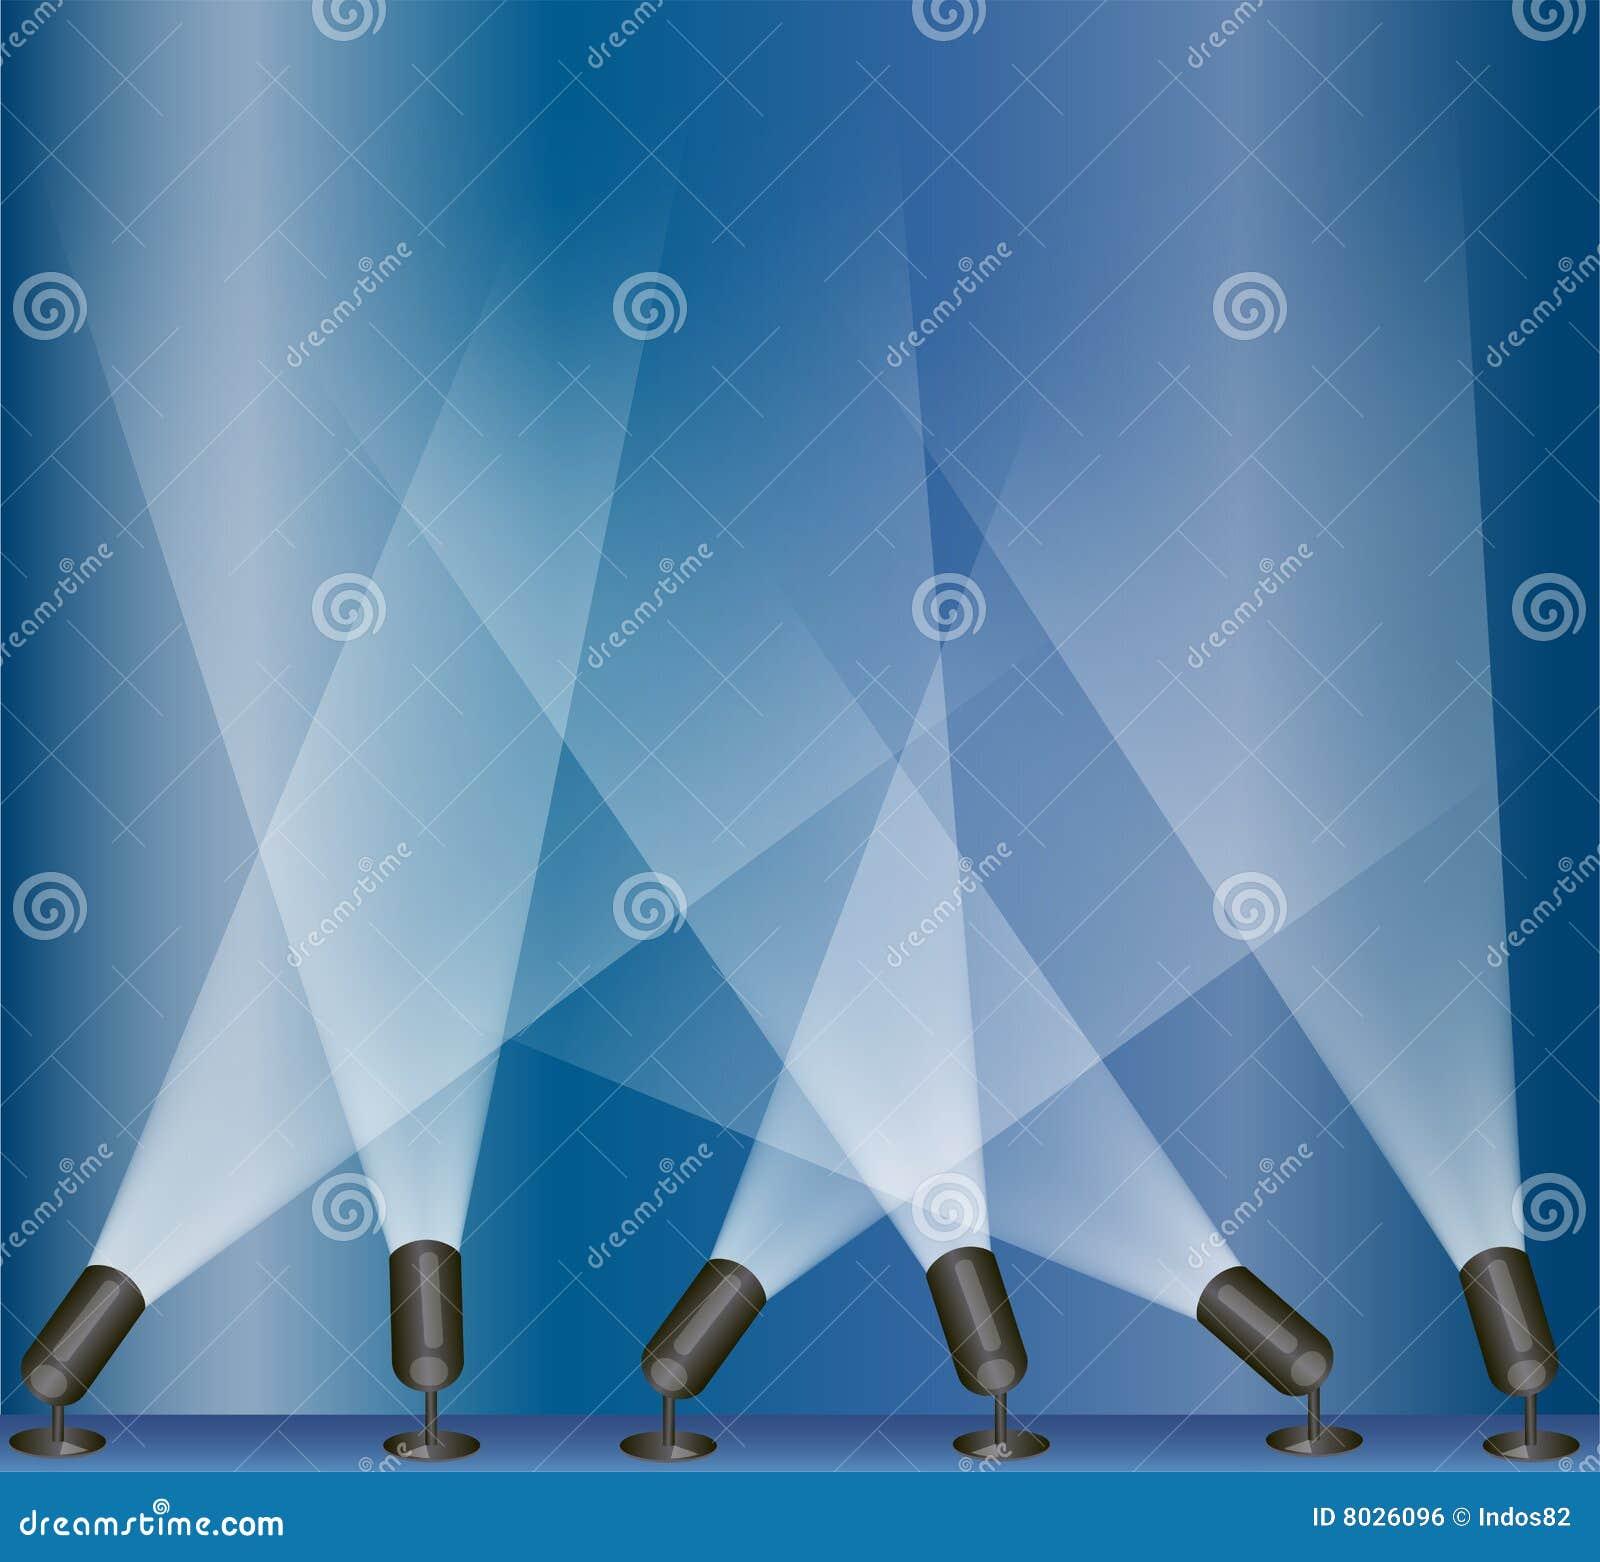 Etapplampor